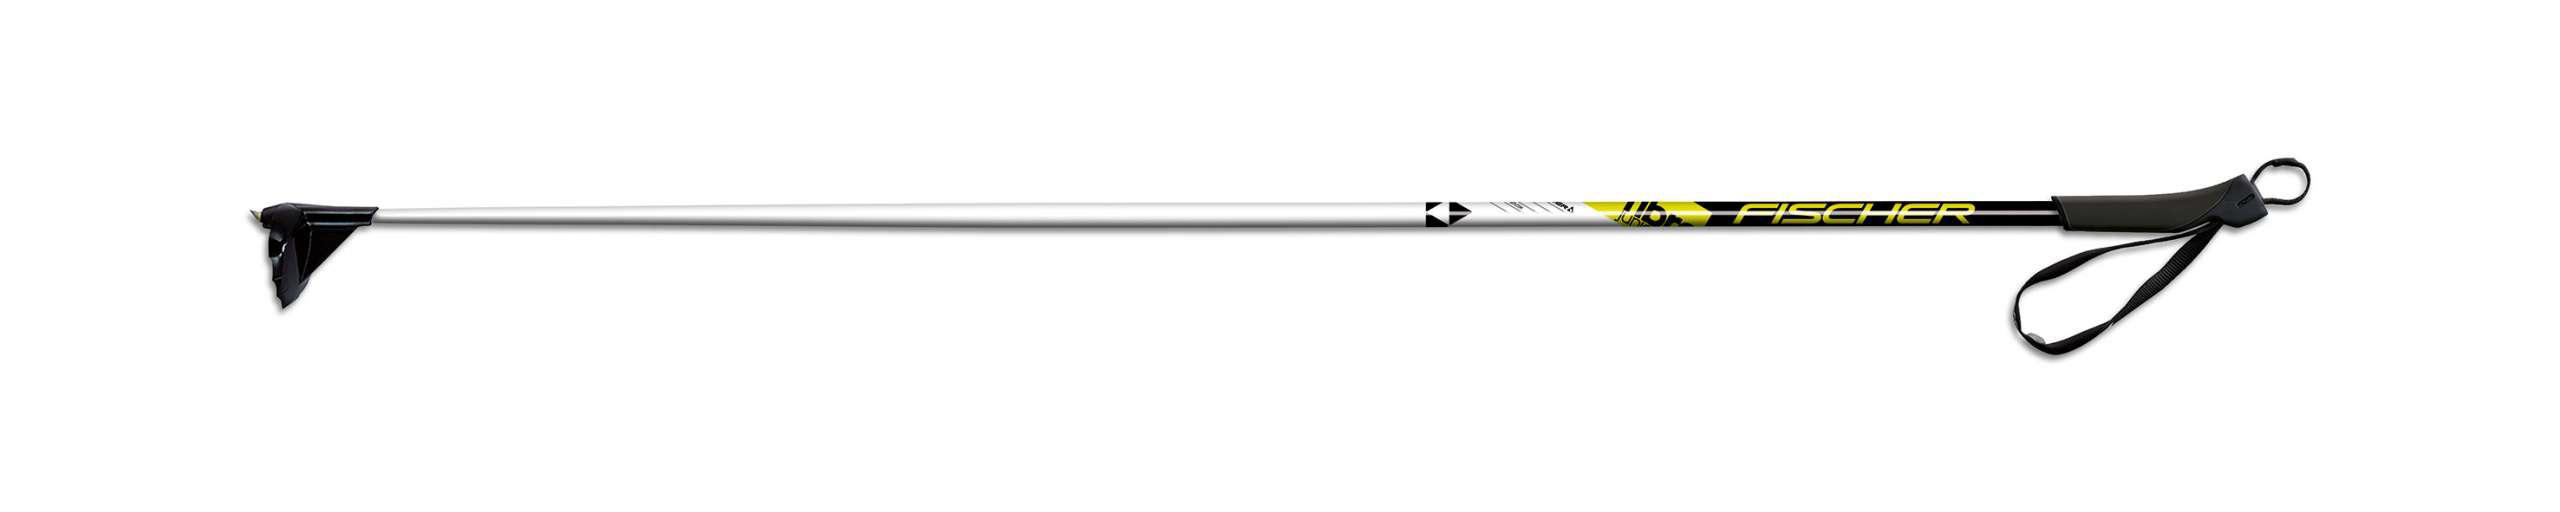 Demo Cross Country Ski Pole Fischer Fibre - Junior Image